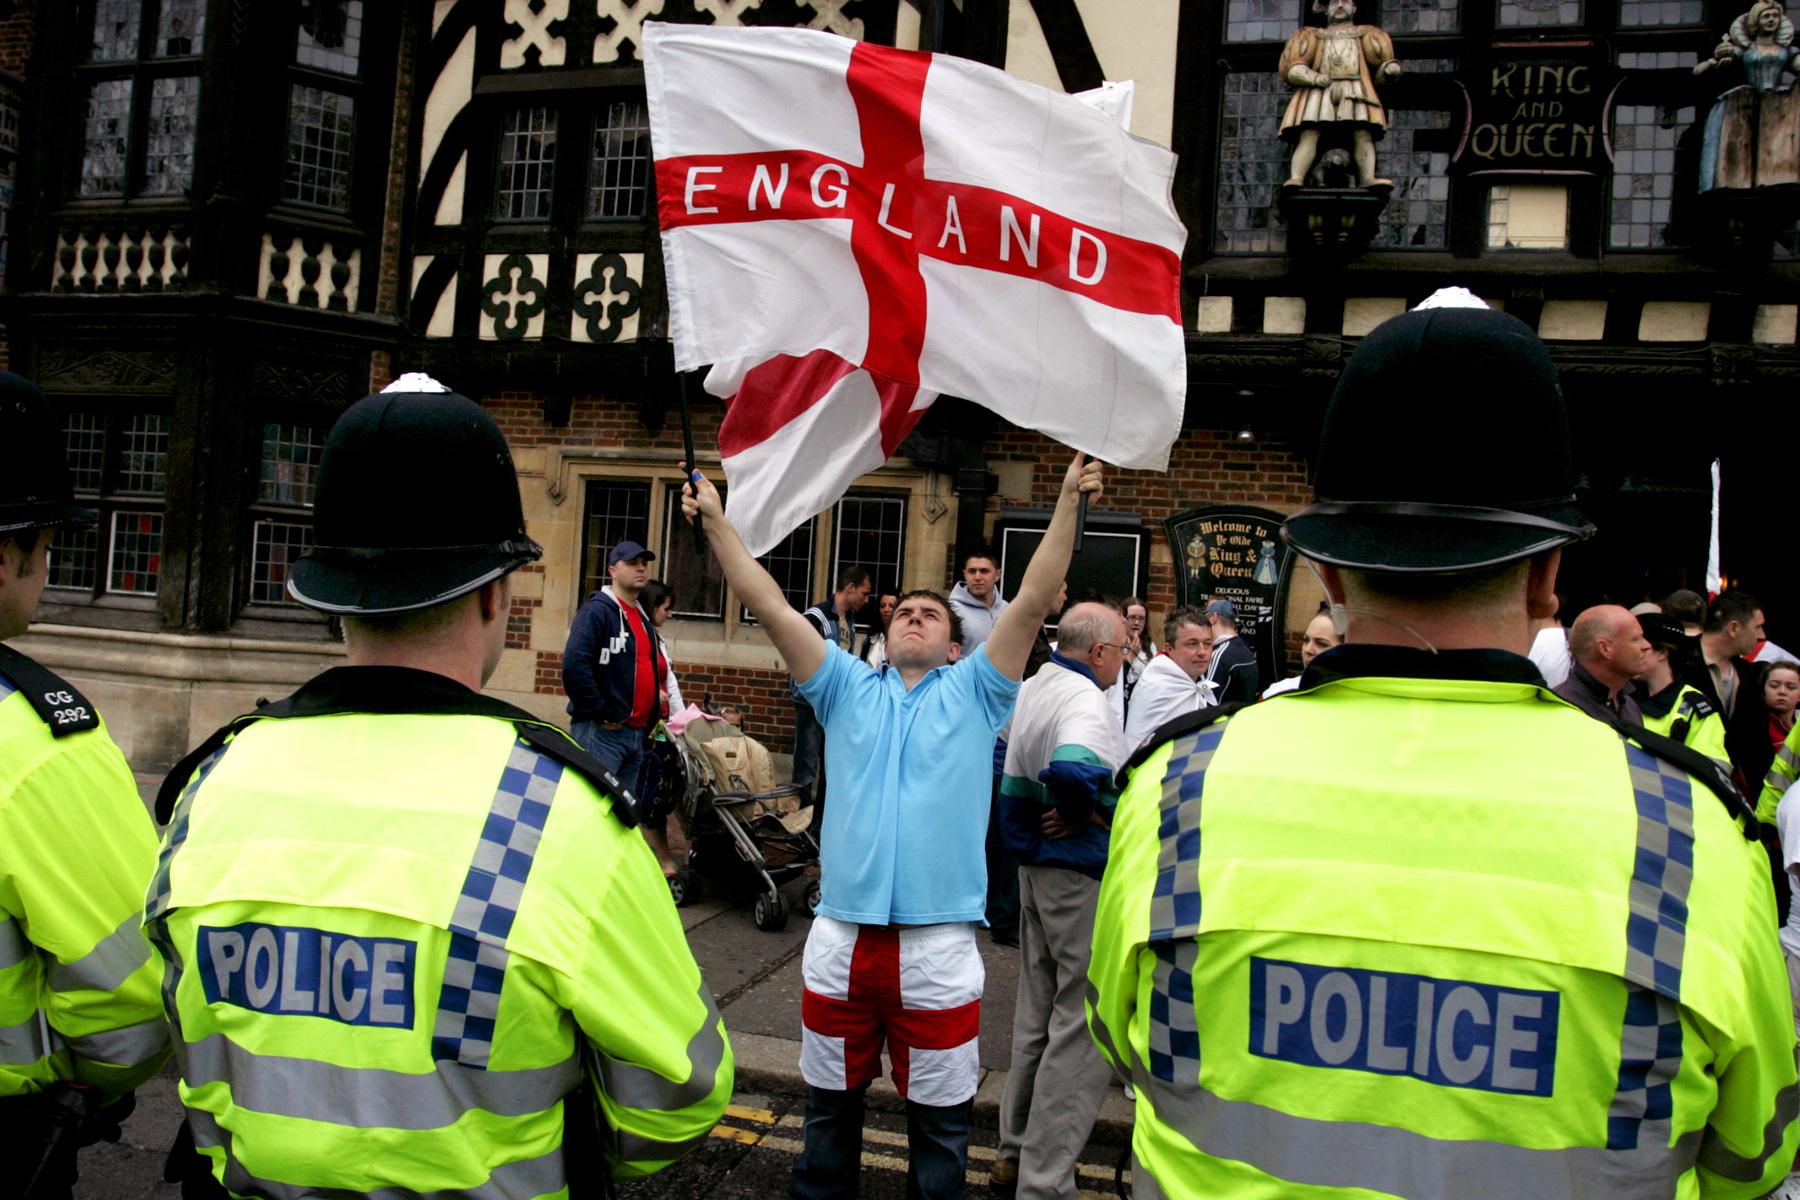 March for England, Brighton.